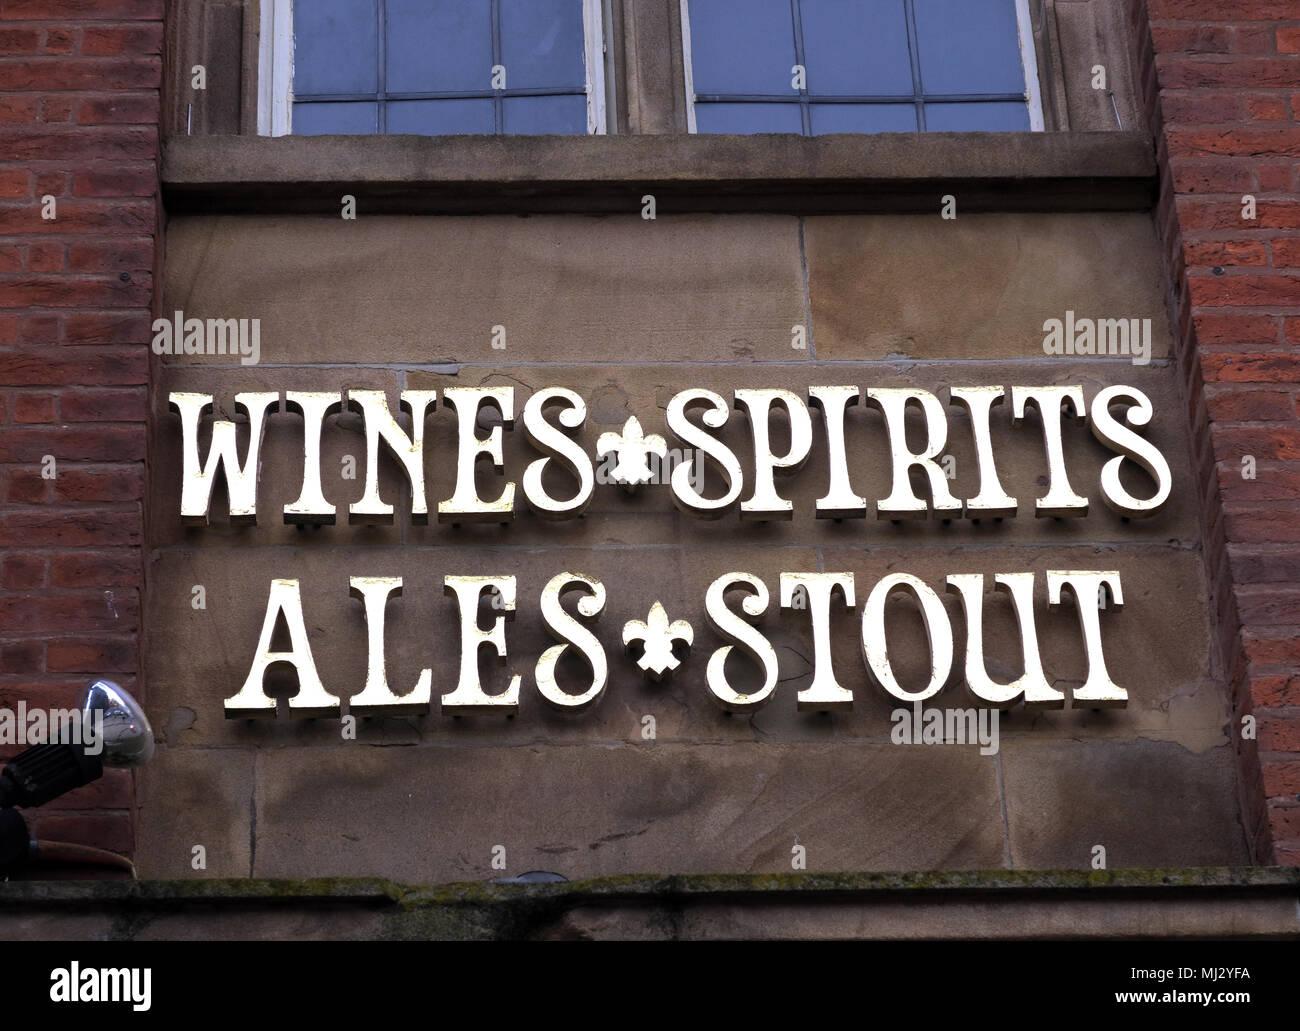 bar,UK,ale,beer,classic,food,Brummie,gotonysmith,barometer,temp,temperature,rain,fair,change,stormy,very